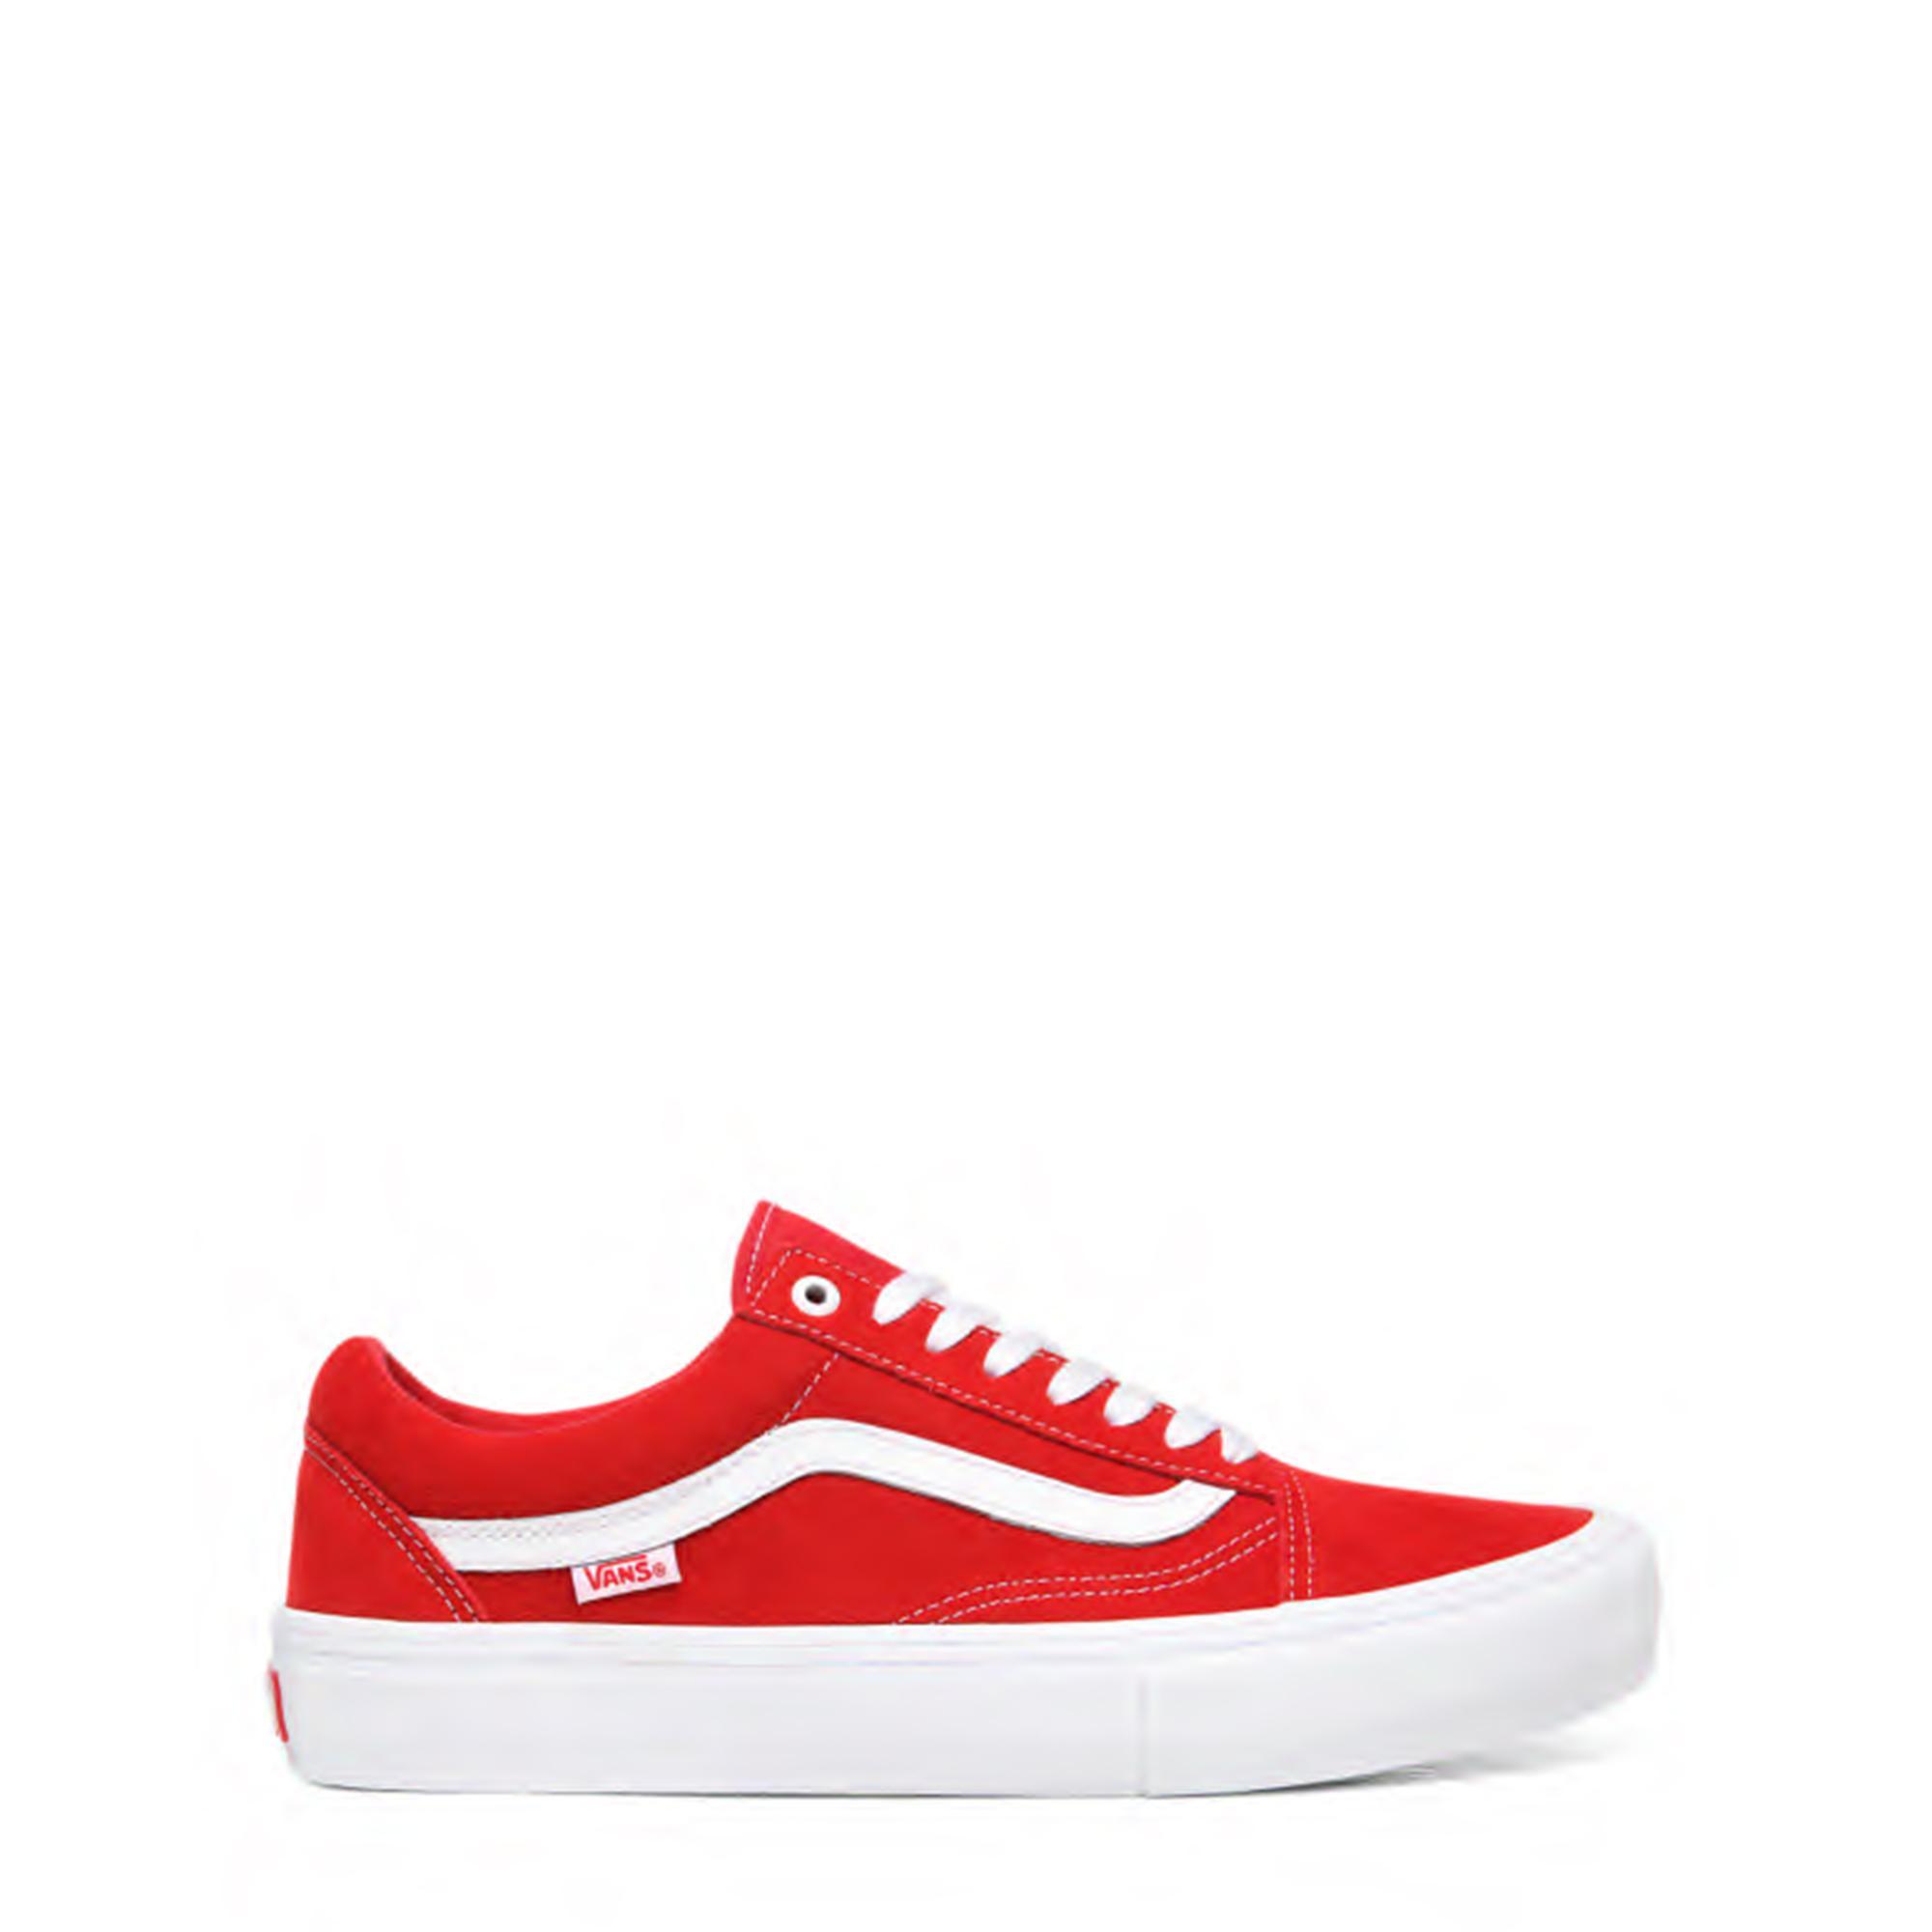 Vans Mn Old Skool Pro (suede) red white